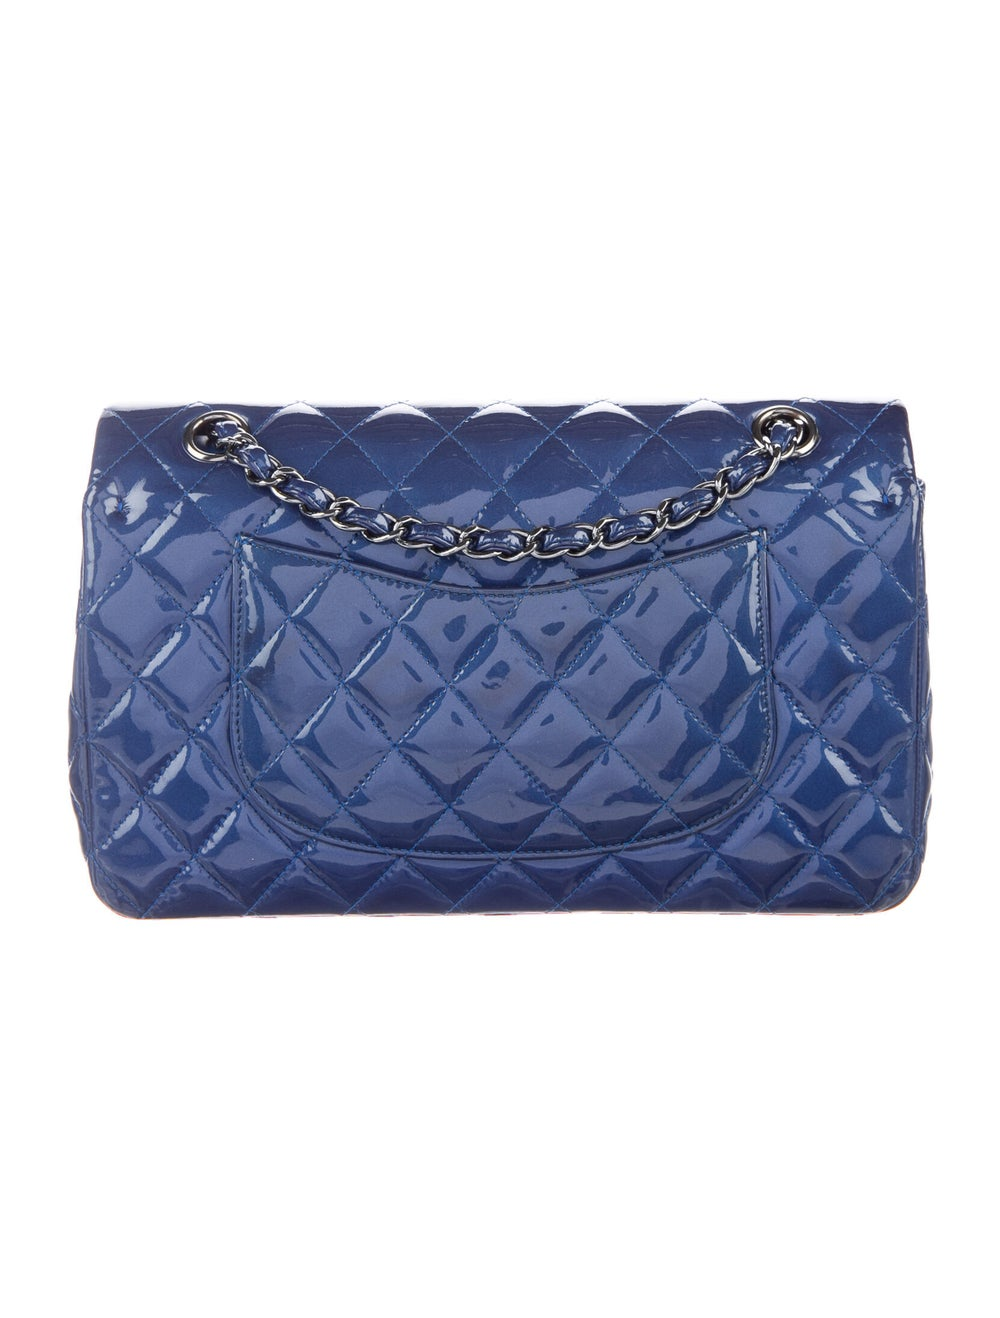 Chanel Medium Patent Flap Bag Blue - image 4